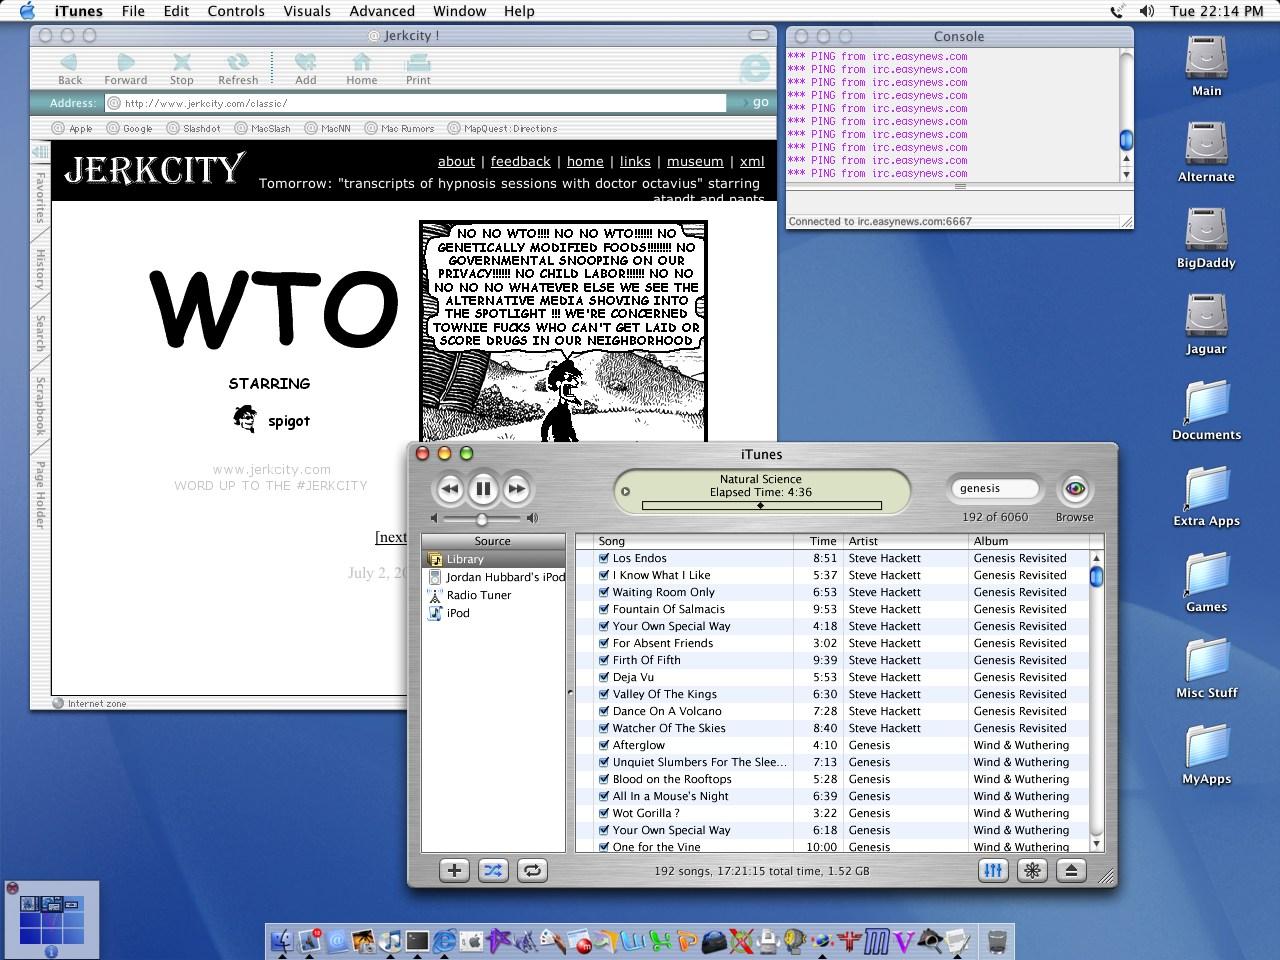 Jordan Hubbard的电脑桌面,截图于2002年7月